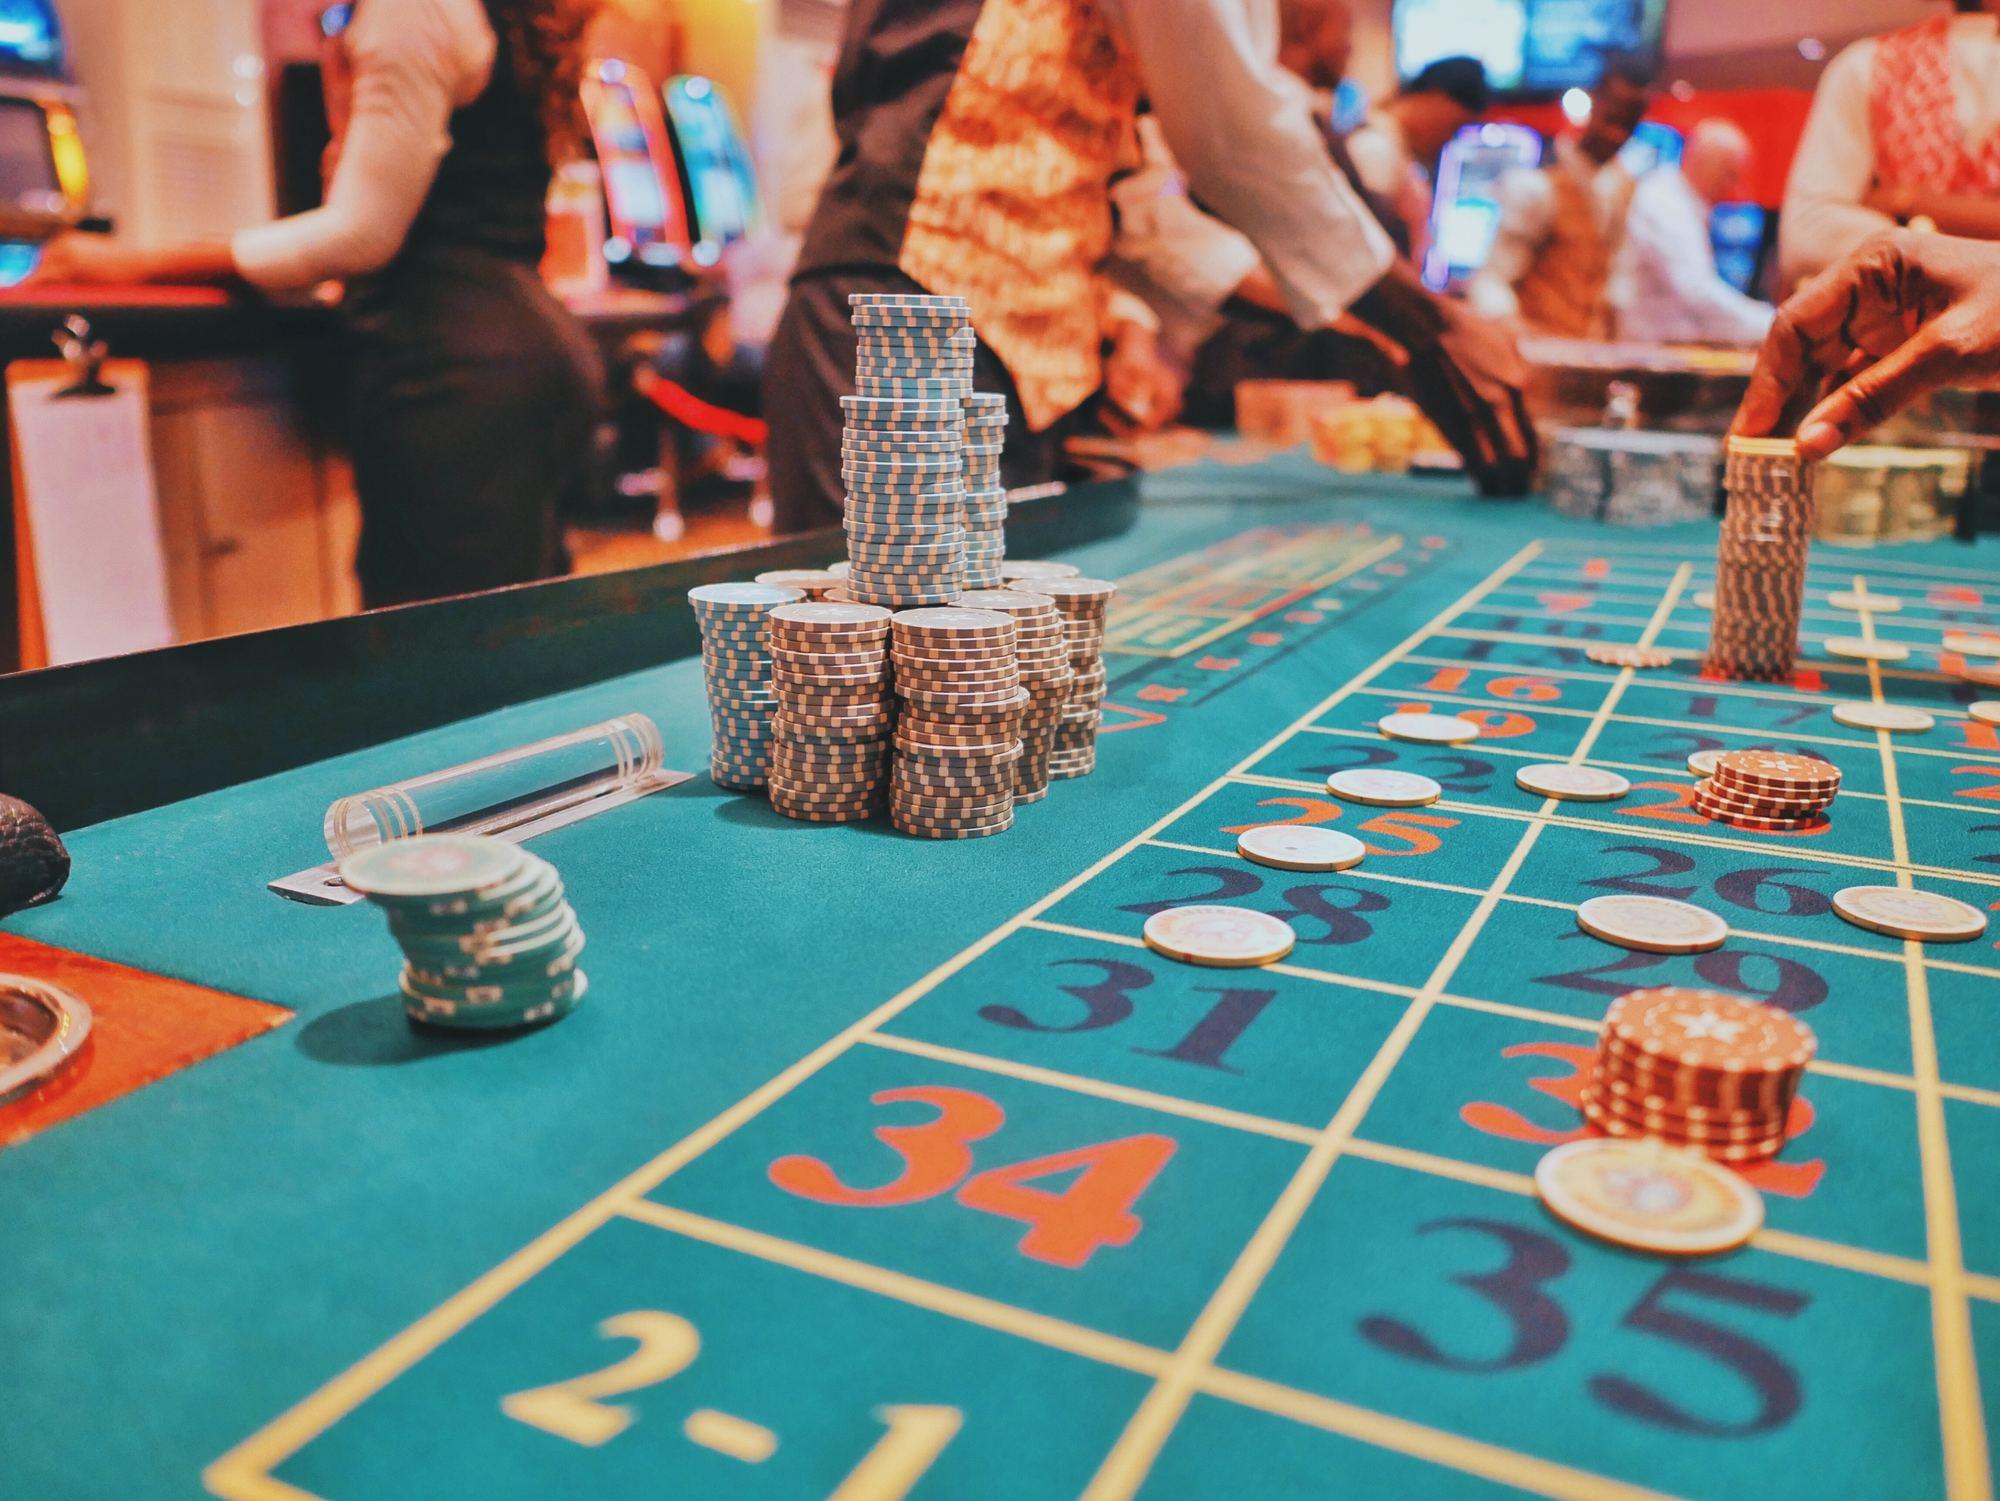 How to start online casino казино монте карло вместе взятых лас вегаса к примеру площадь